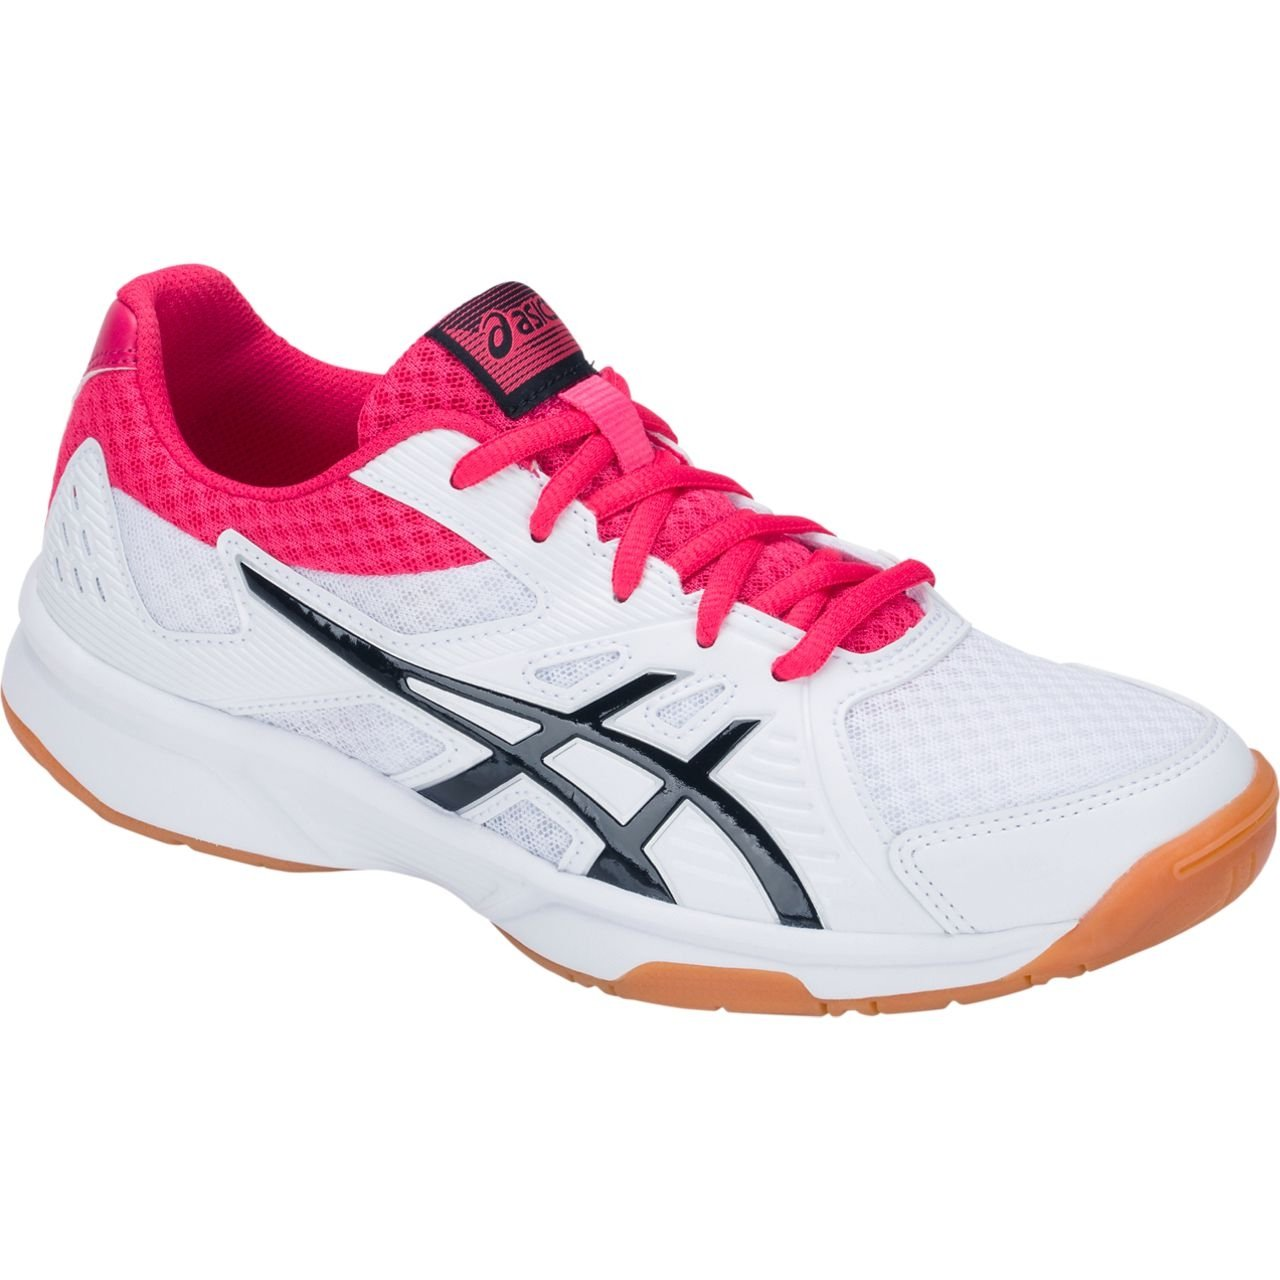 ASICS Upcourt 3 Shoe Women's Volleyball B077NGX4P9 11.5 B(M) US|White/Pixel Pink